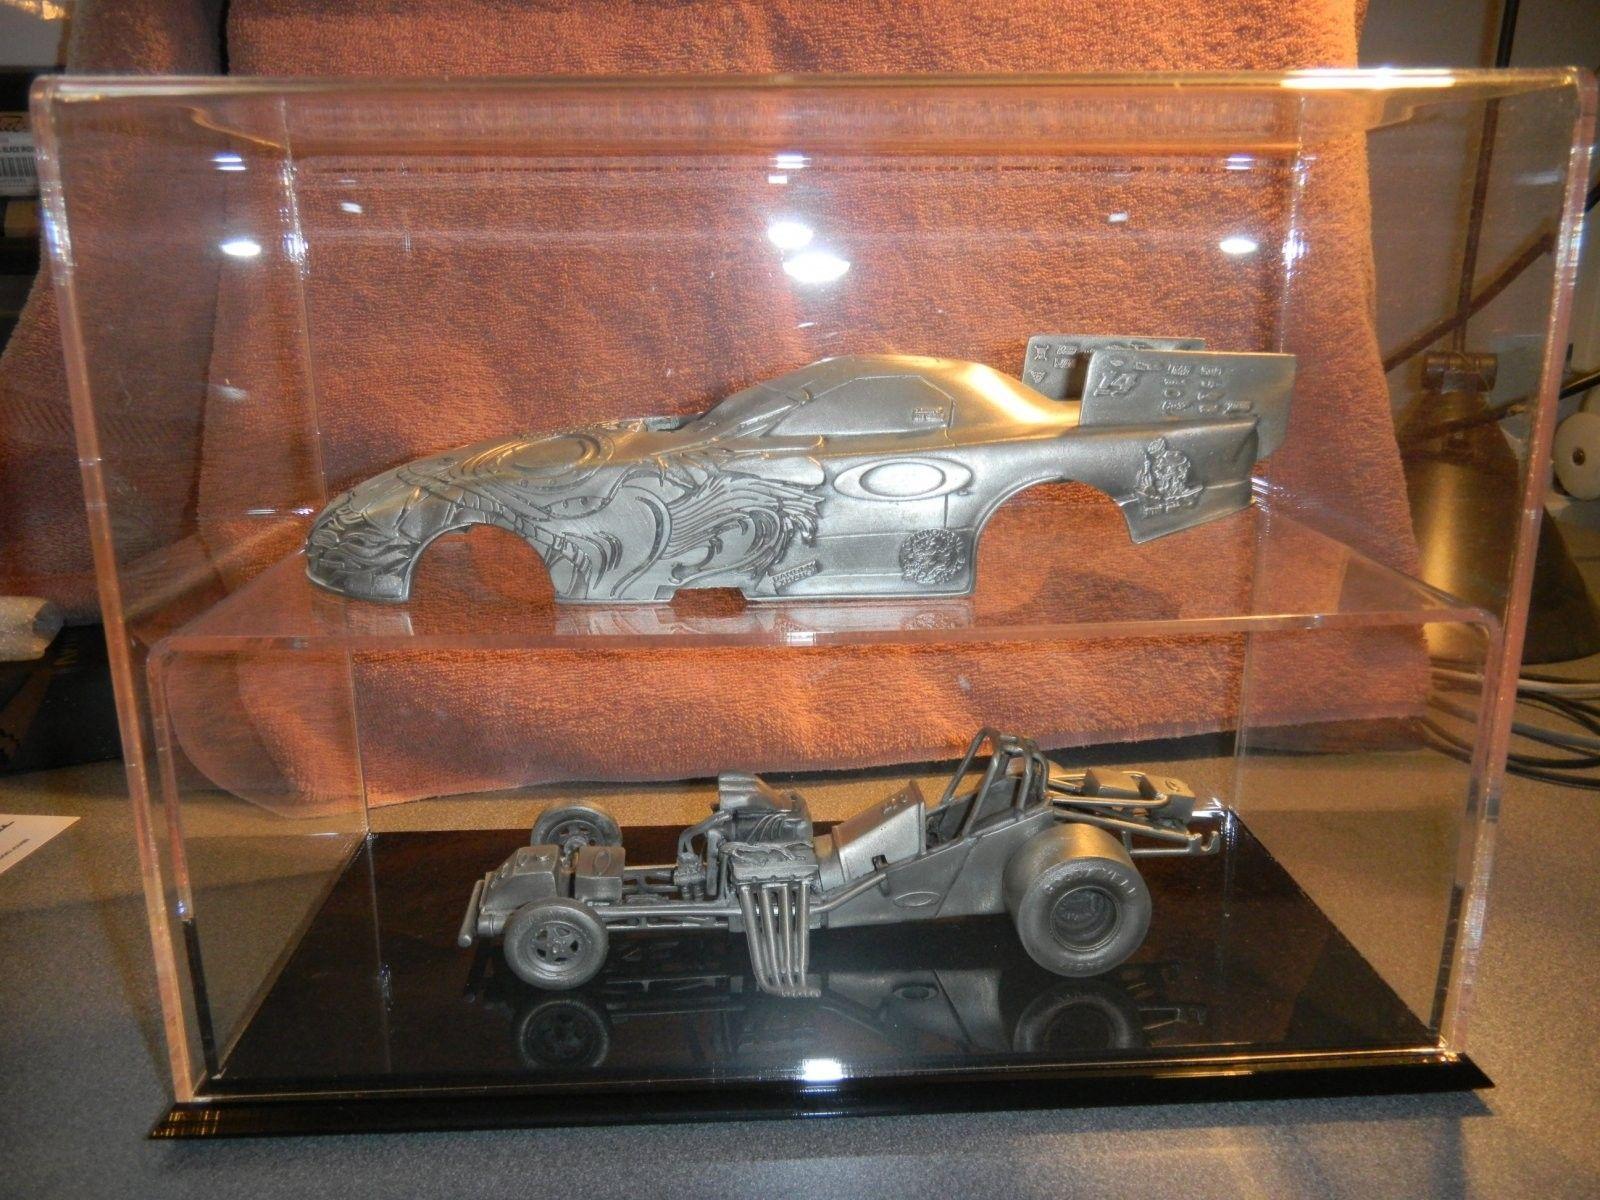 Scotty Cannon PEWTER Funny Car - DSCN1862.JPG